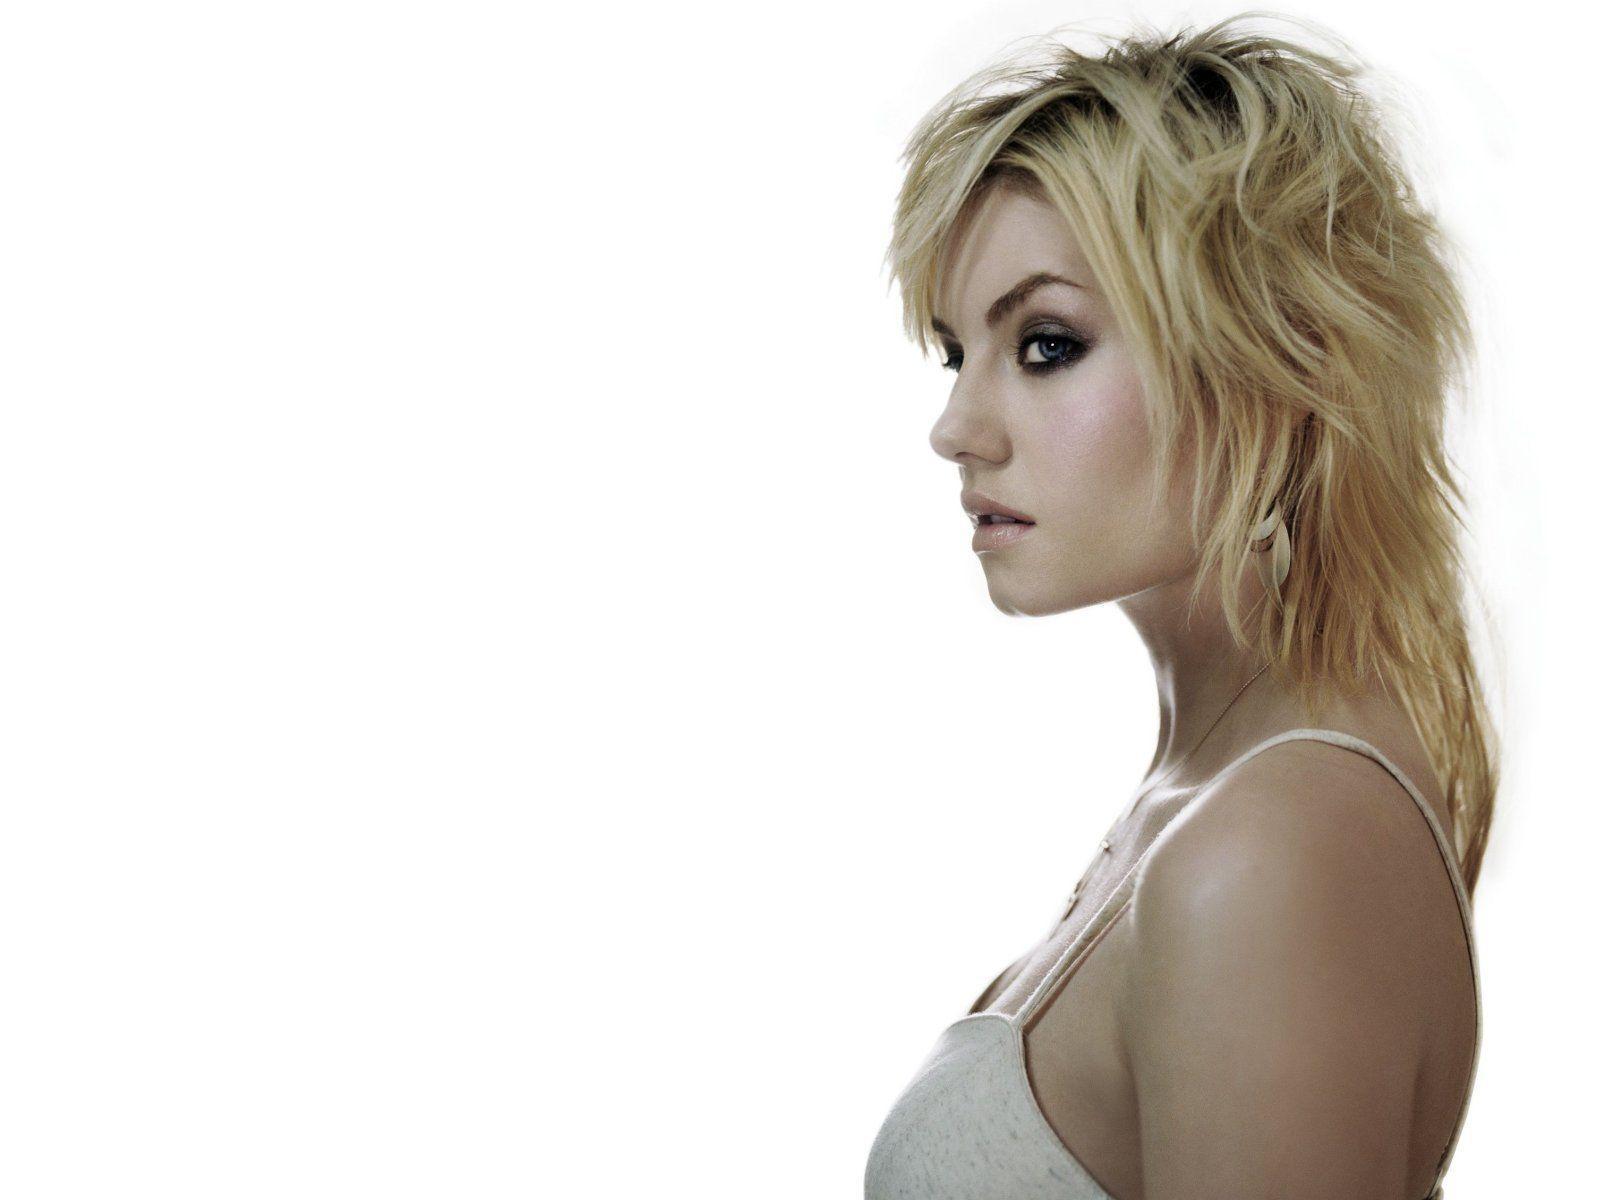 New Elisha Cuthbert Hot Model Hd Photo Wallpapers -8909